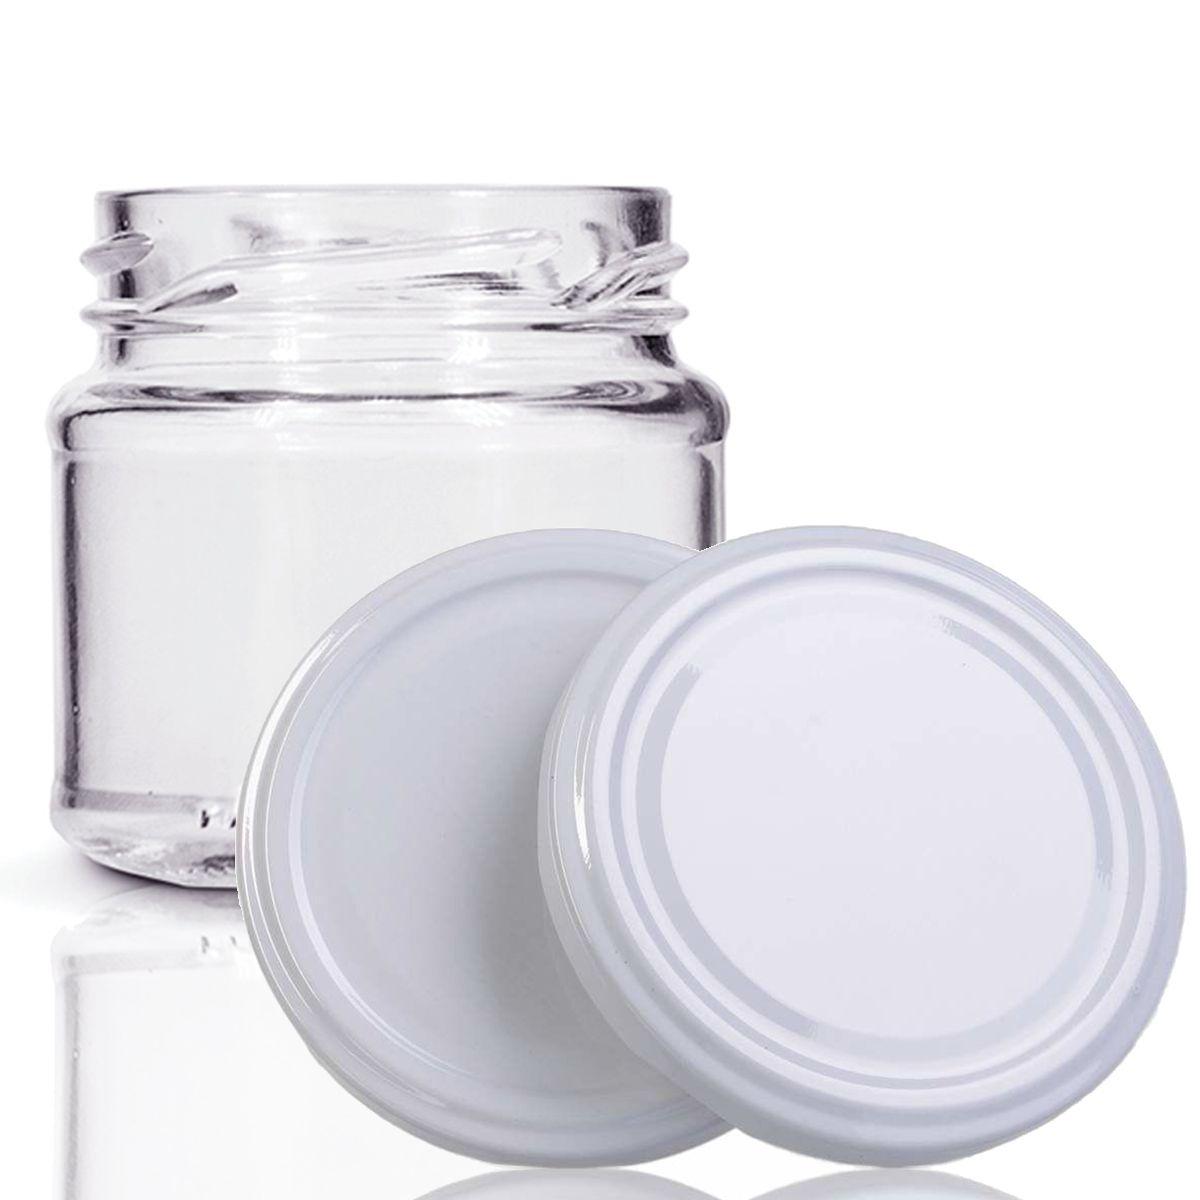 96 Potes De Vidro Mini Belém 150 Ml Tampa Branca + Lacre  - EMPÓRIO PACK